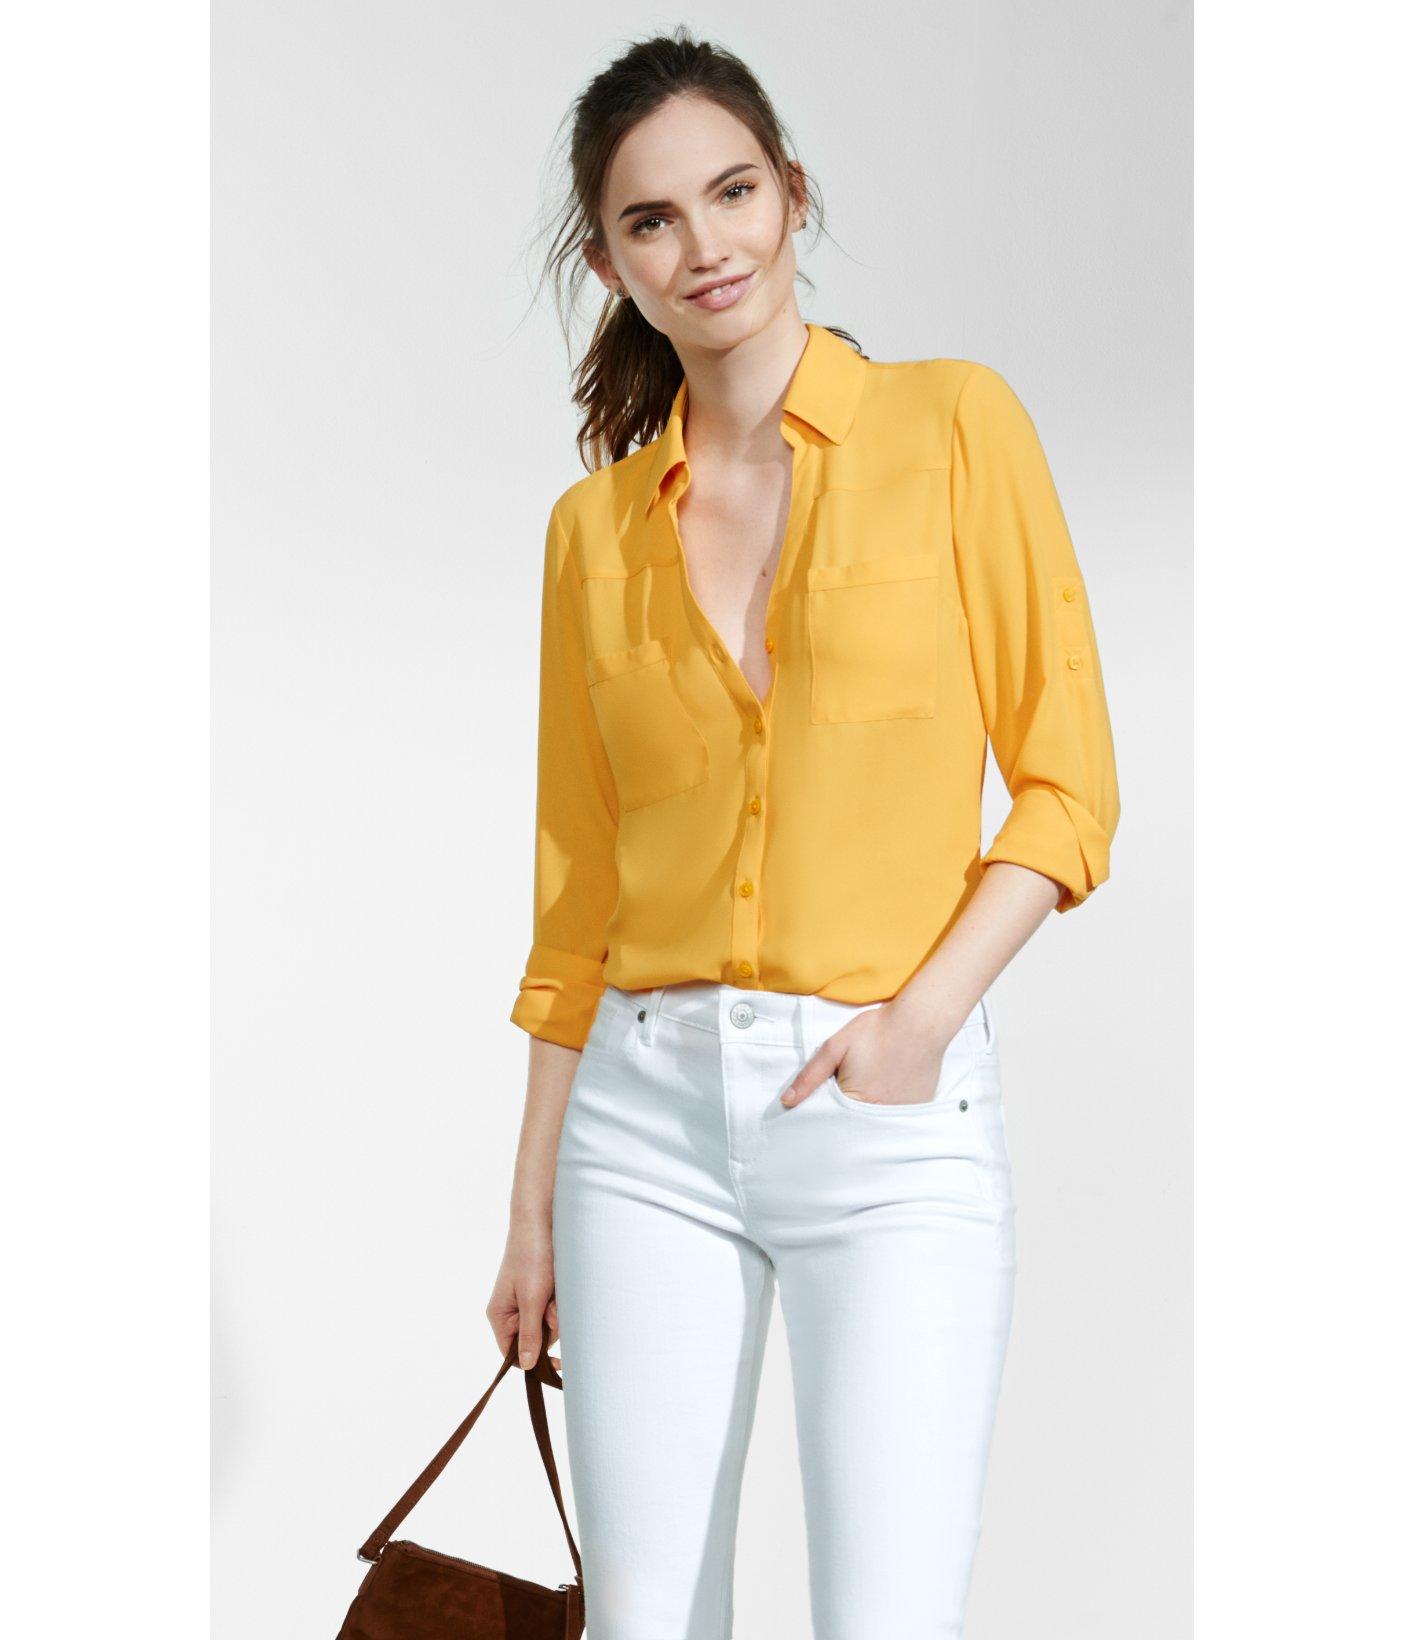 55b6425d77c7 slim fit satin portofino shirt EXPRESS VIEW Source · Lyst Express Original Fit  Convertible Sleeve Portofino Shirt in Yellow